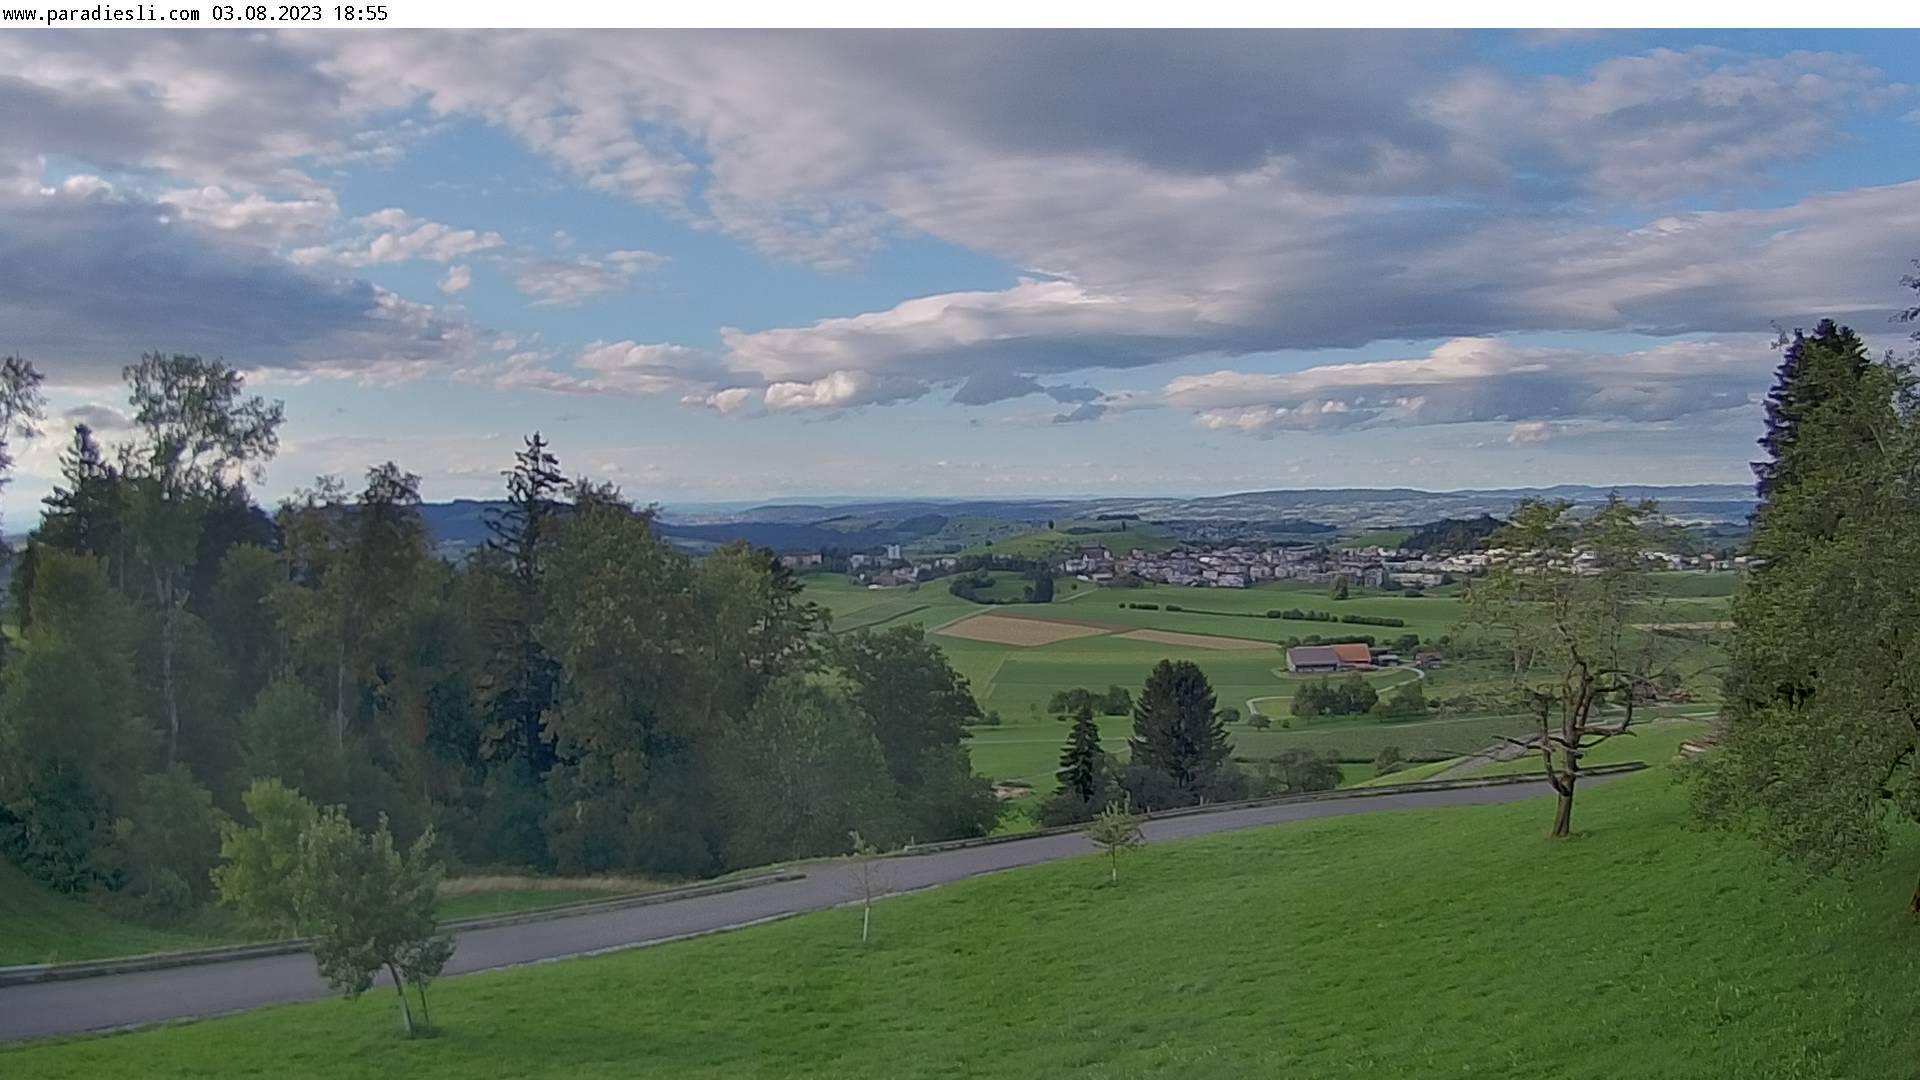 Webcam Menzingen ZG › North: Schurtannen